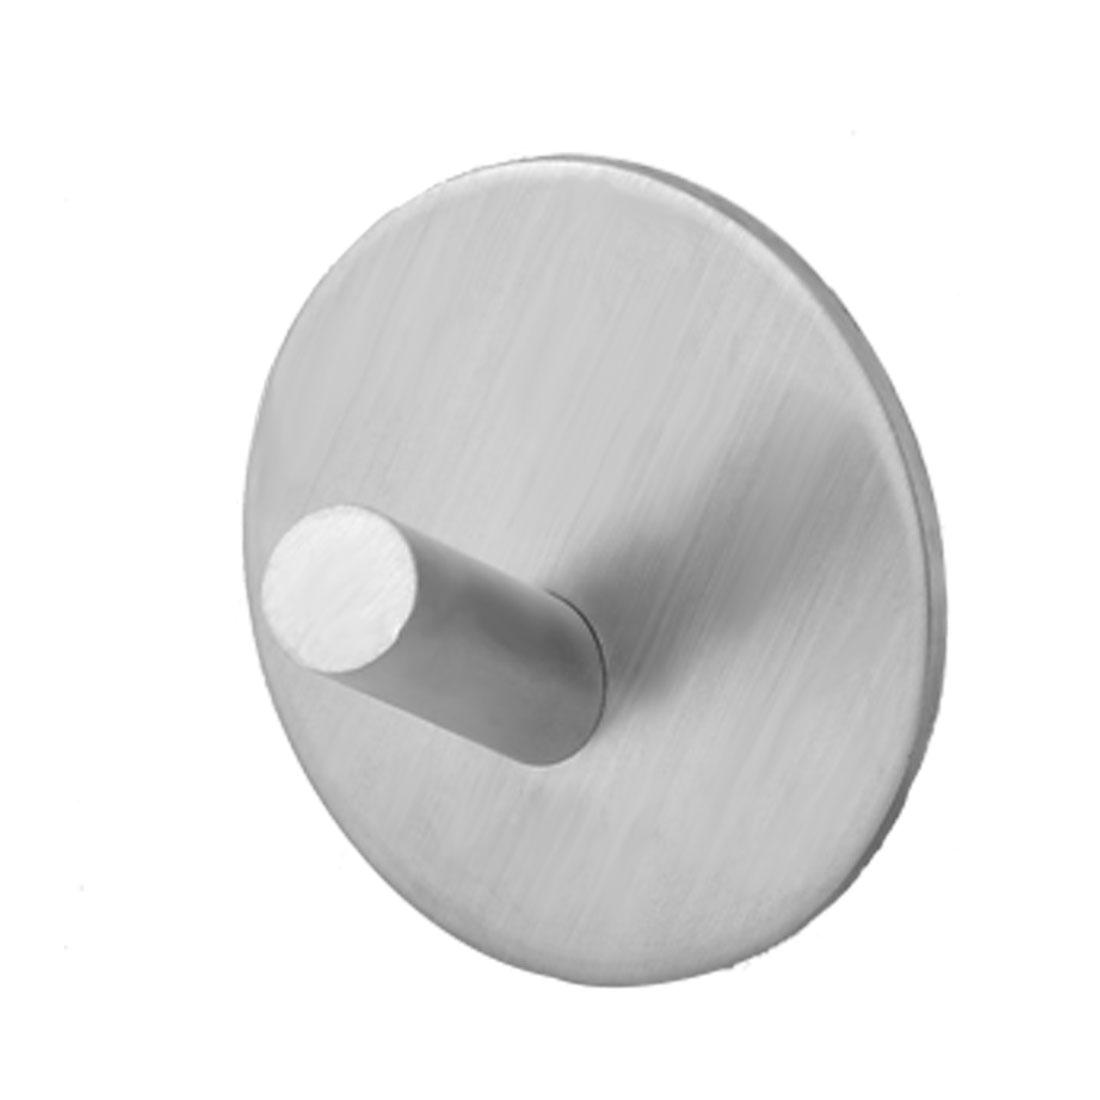 Household Bathroom Metal Self-adhesive Clothes Towel Hanger Hook Silver Tone